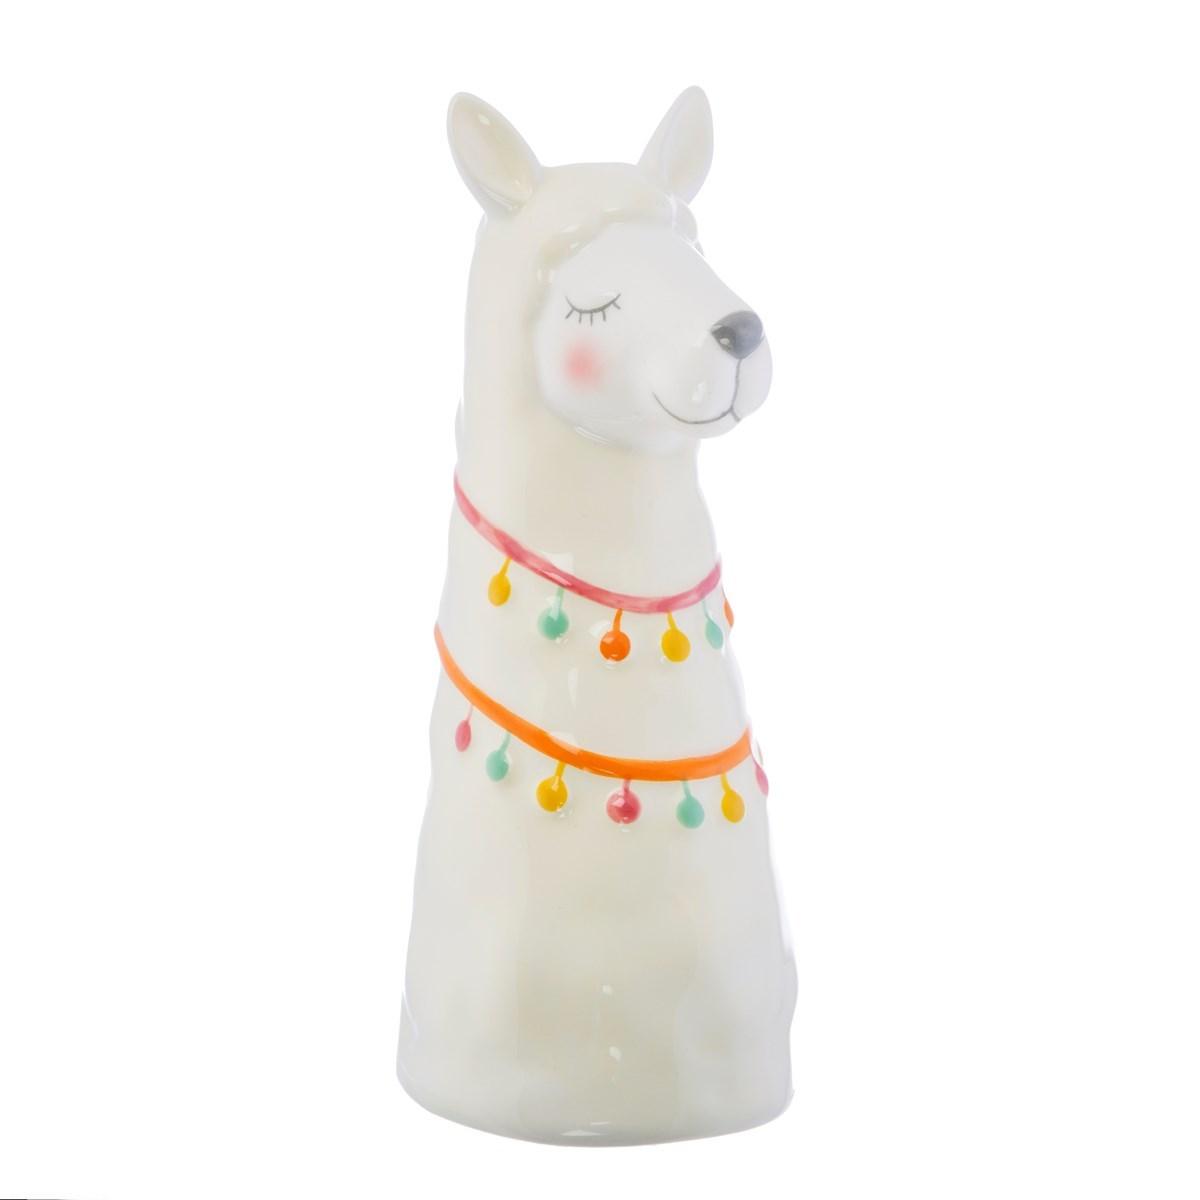 Sass /& Belle Lima Llama Planter